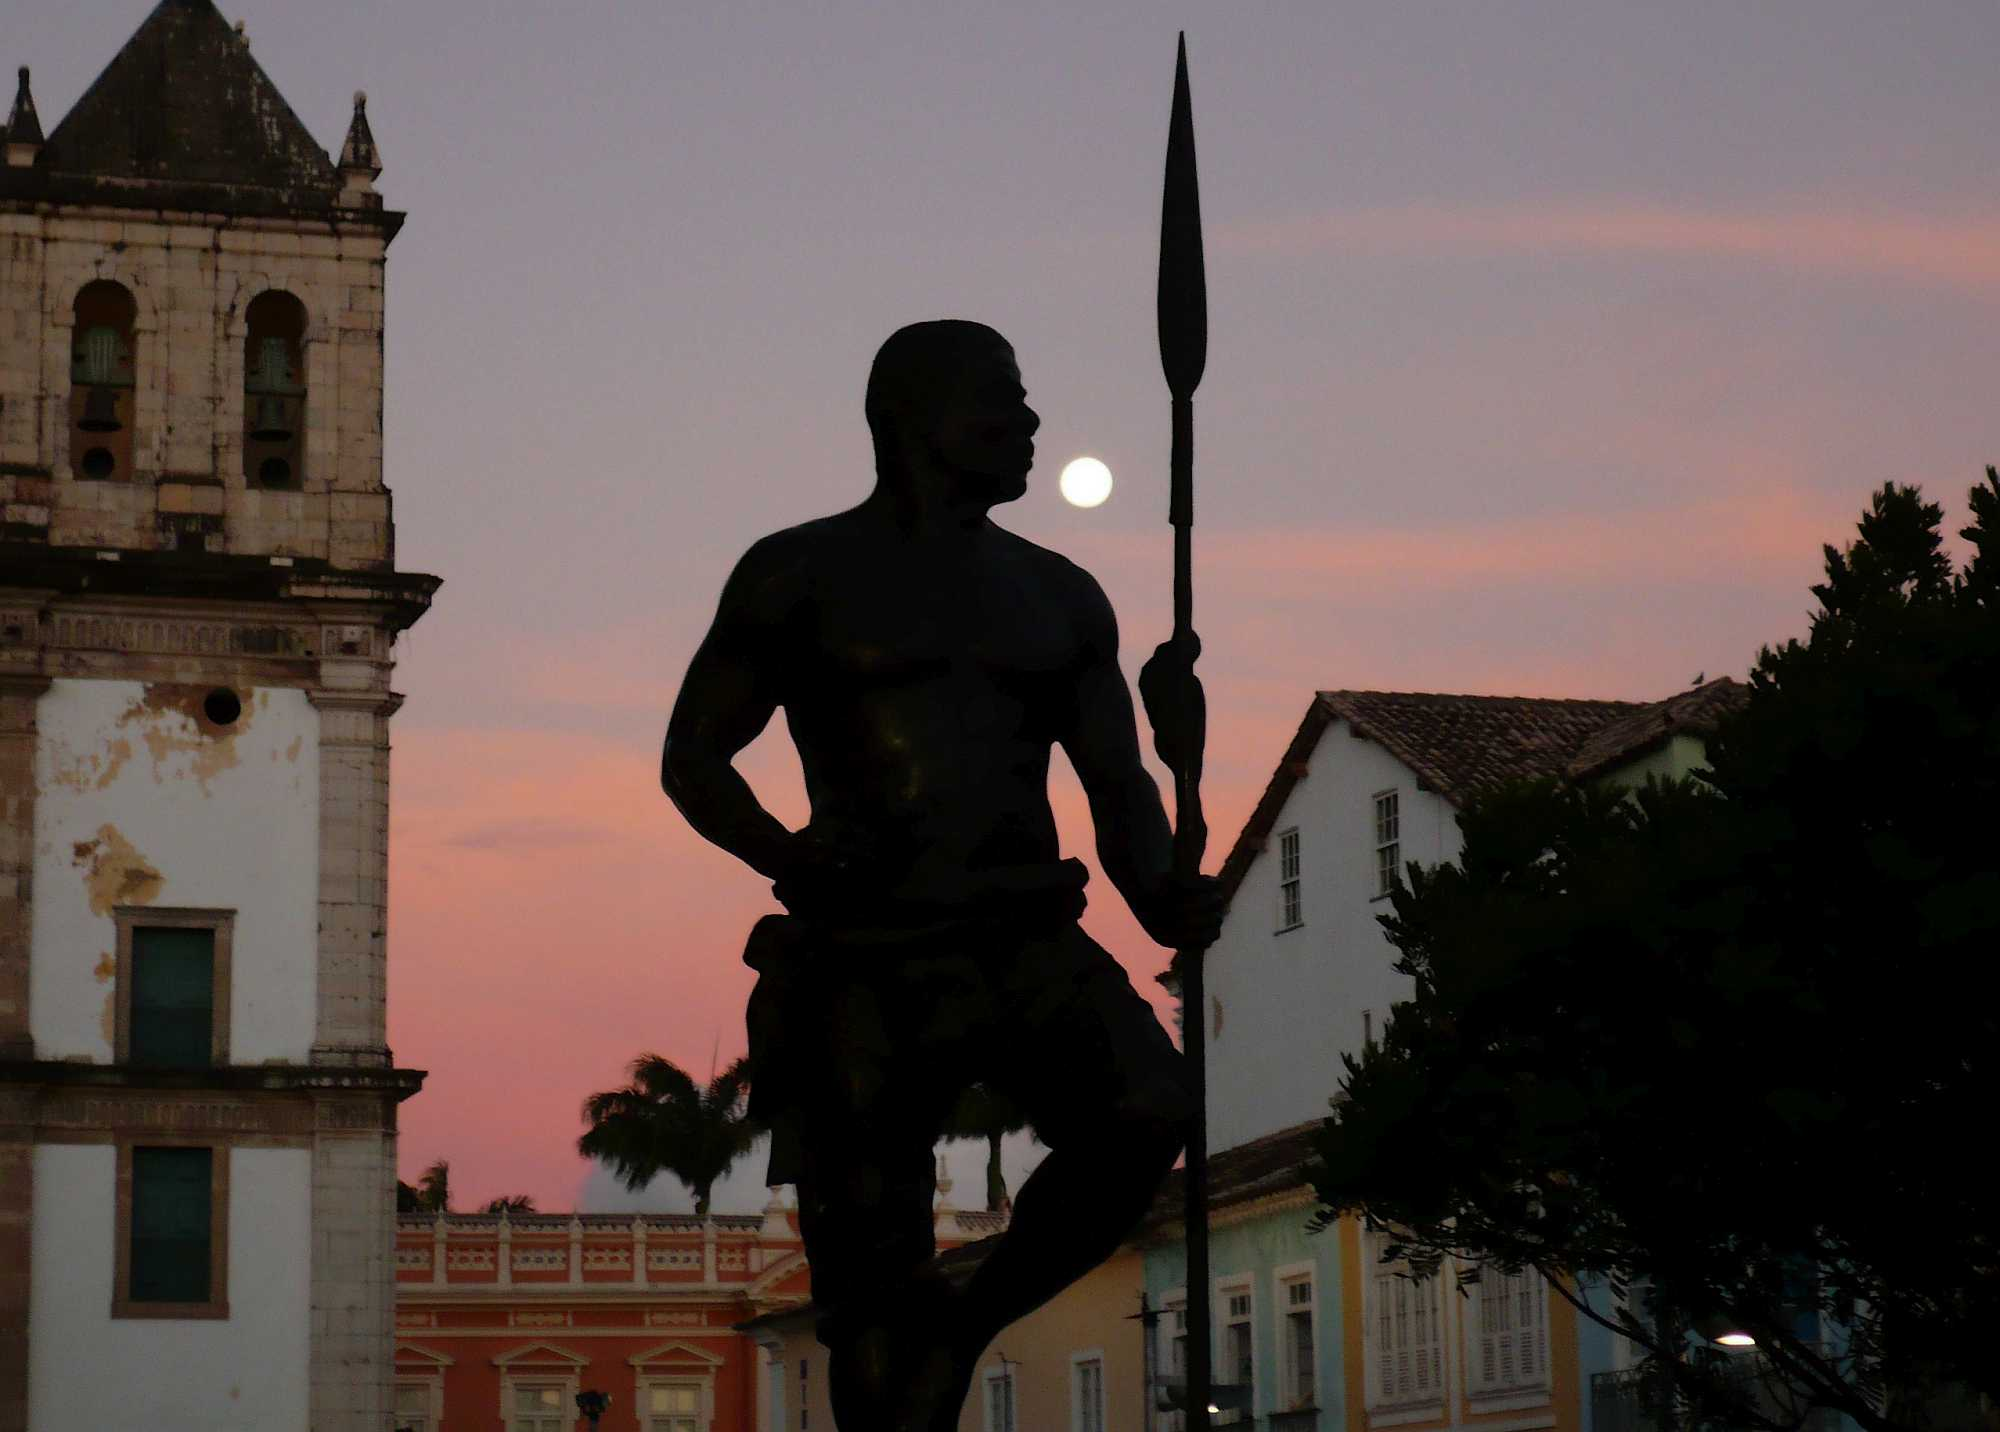 Bronze sculpture of Zumbi dos Palmares, in Salvador, Bahia state